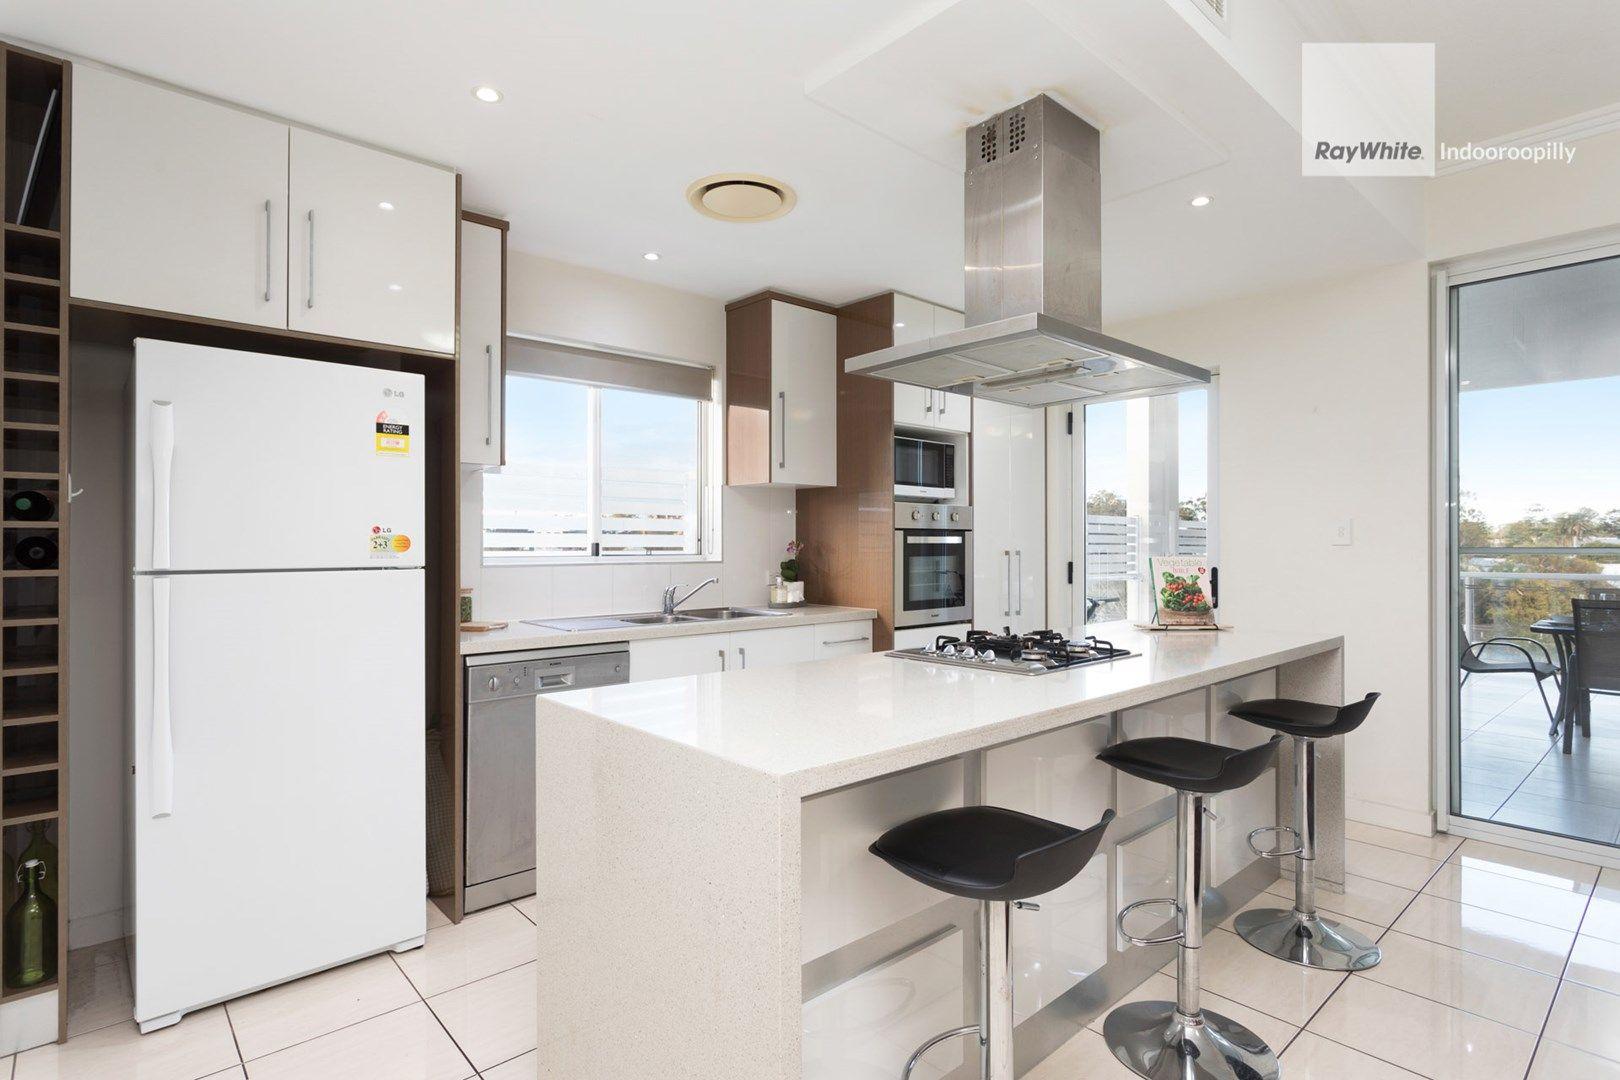 4/47 Coonan Street, Indooroopilly QLD 4068, Image 0